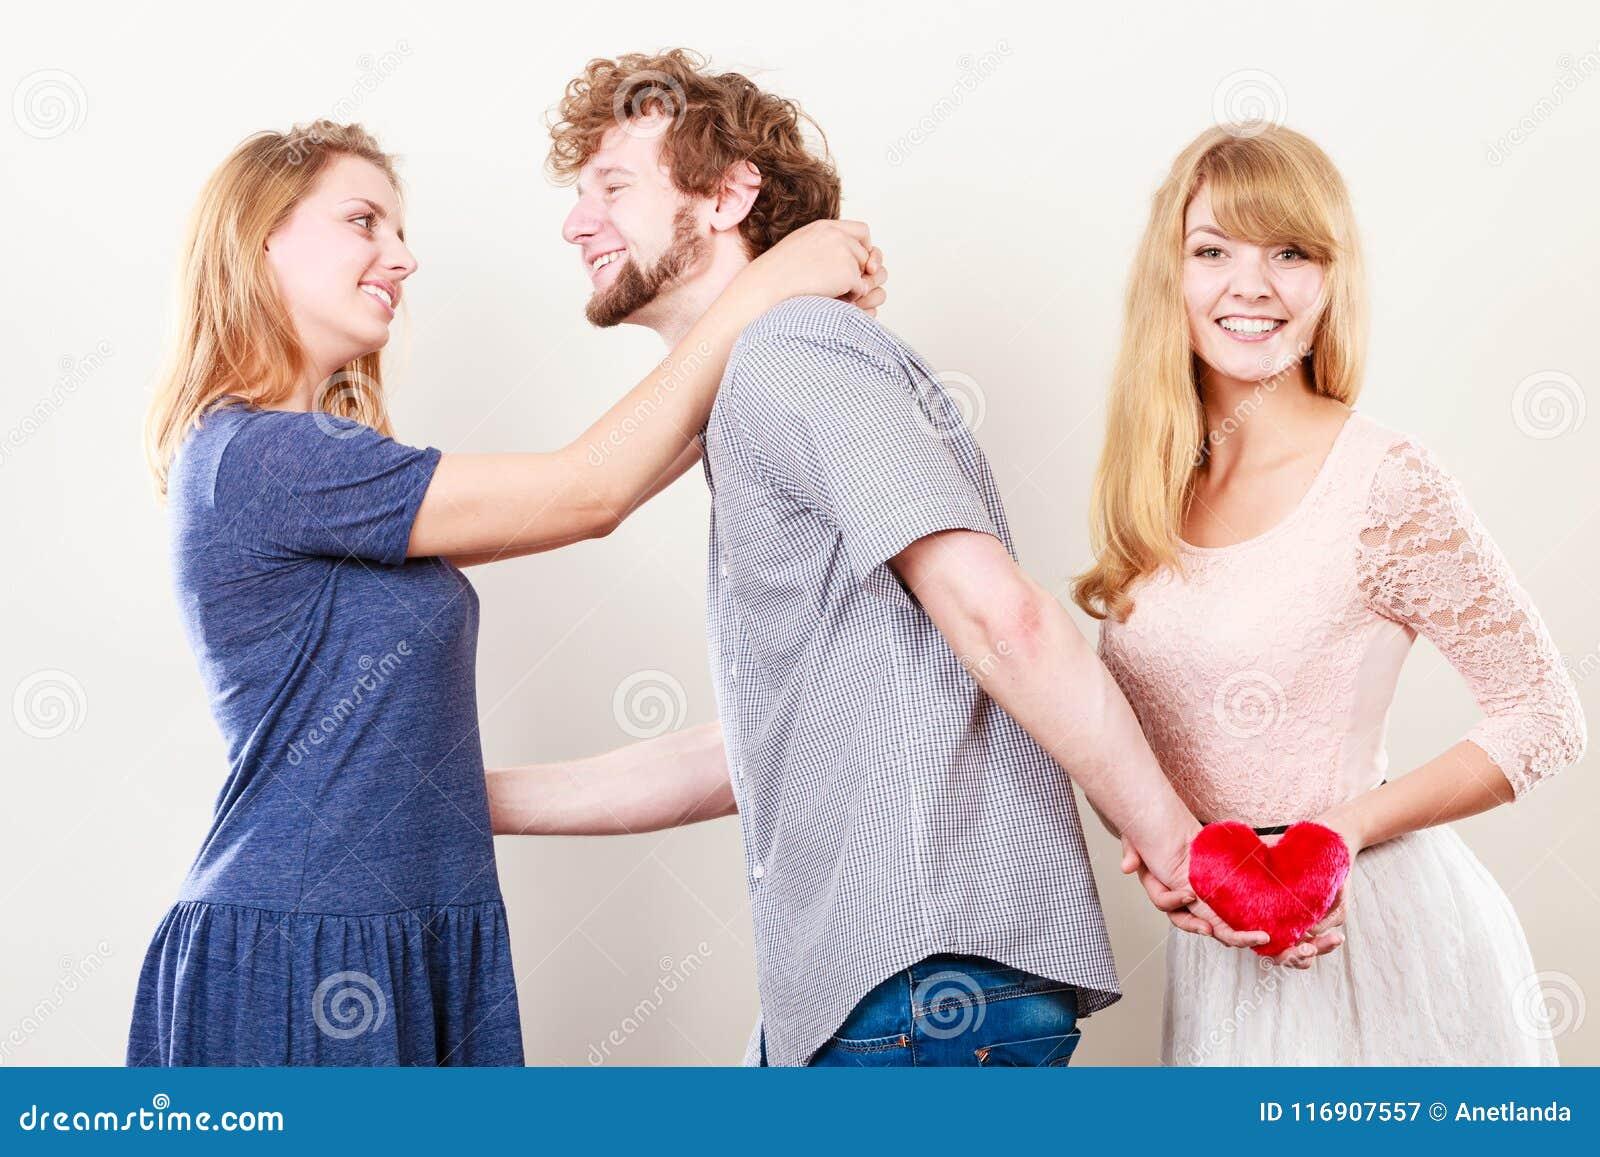 flirting vs cheating infidelity images pictures women like